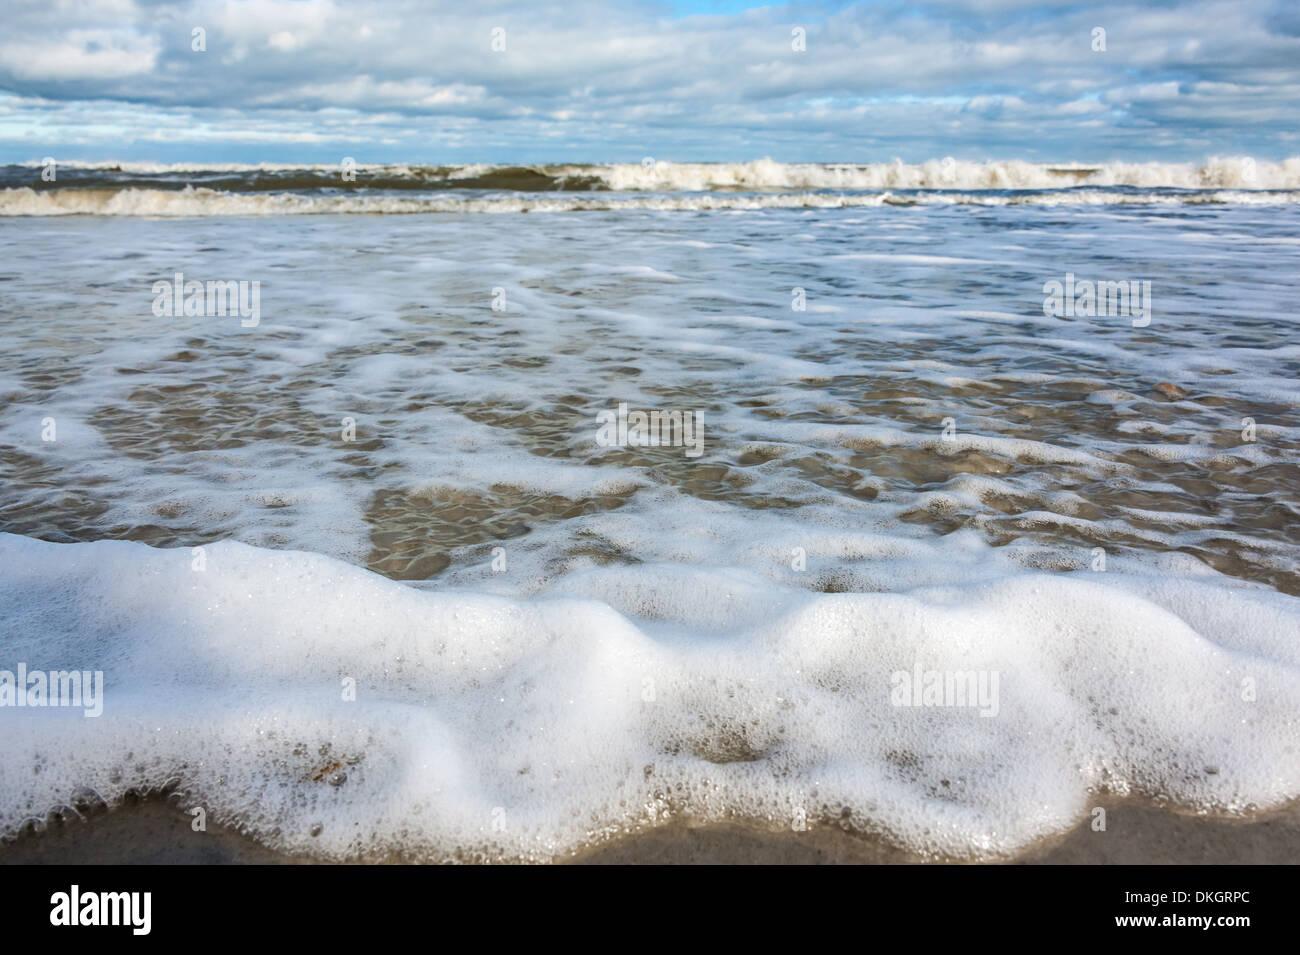 ocean waves spread thin foam laced sheets of water across the